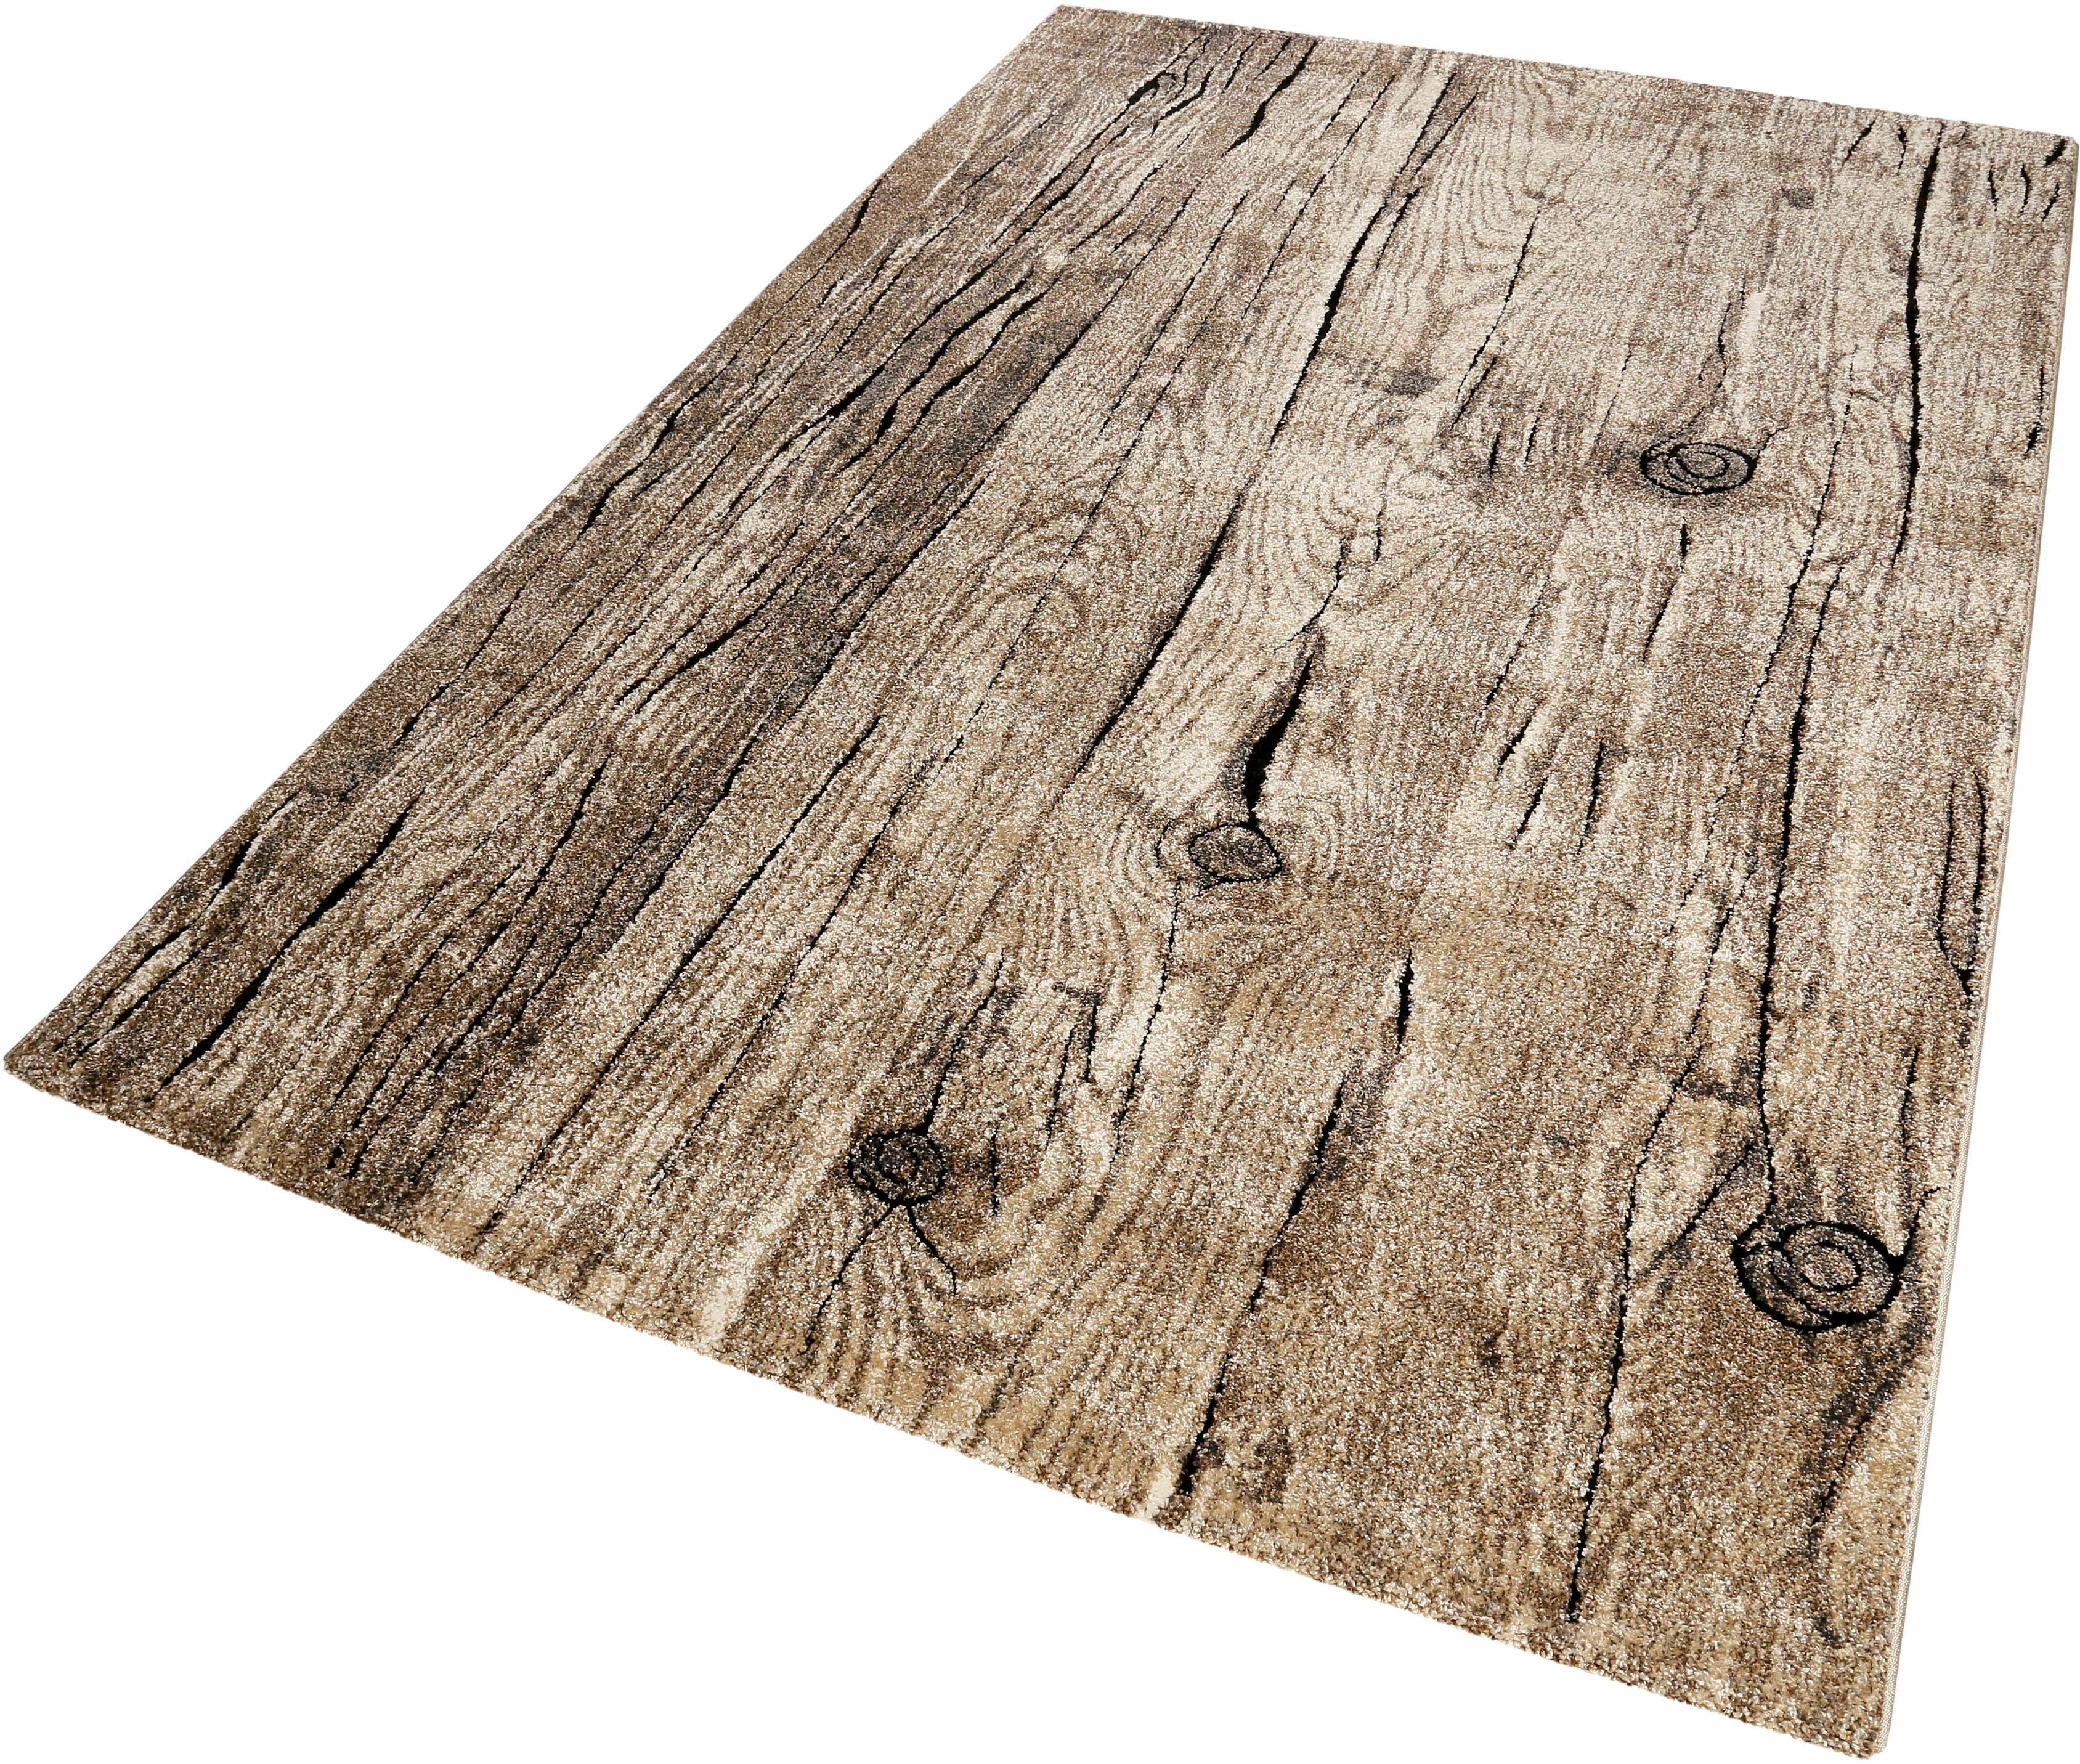 Teppich Woody Wecon Home rechteckig Höhe 13 mm maschinell gewebt